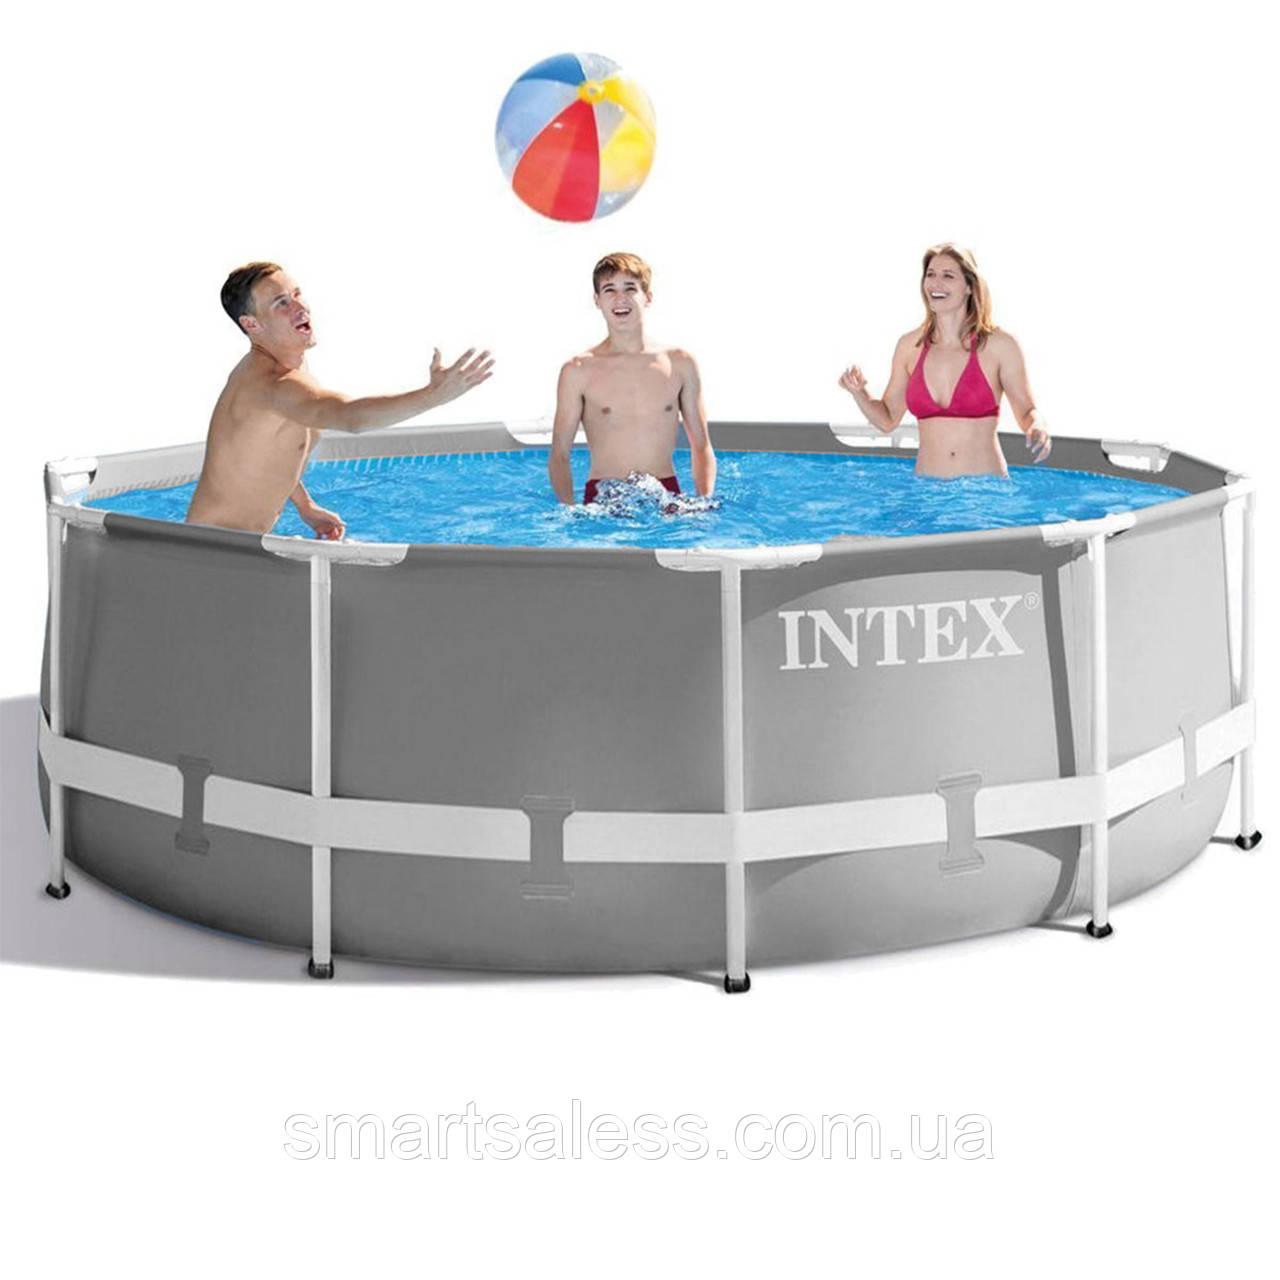 Каркасний басейн Intex, 305 x 99 см, чаша + каркас